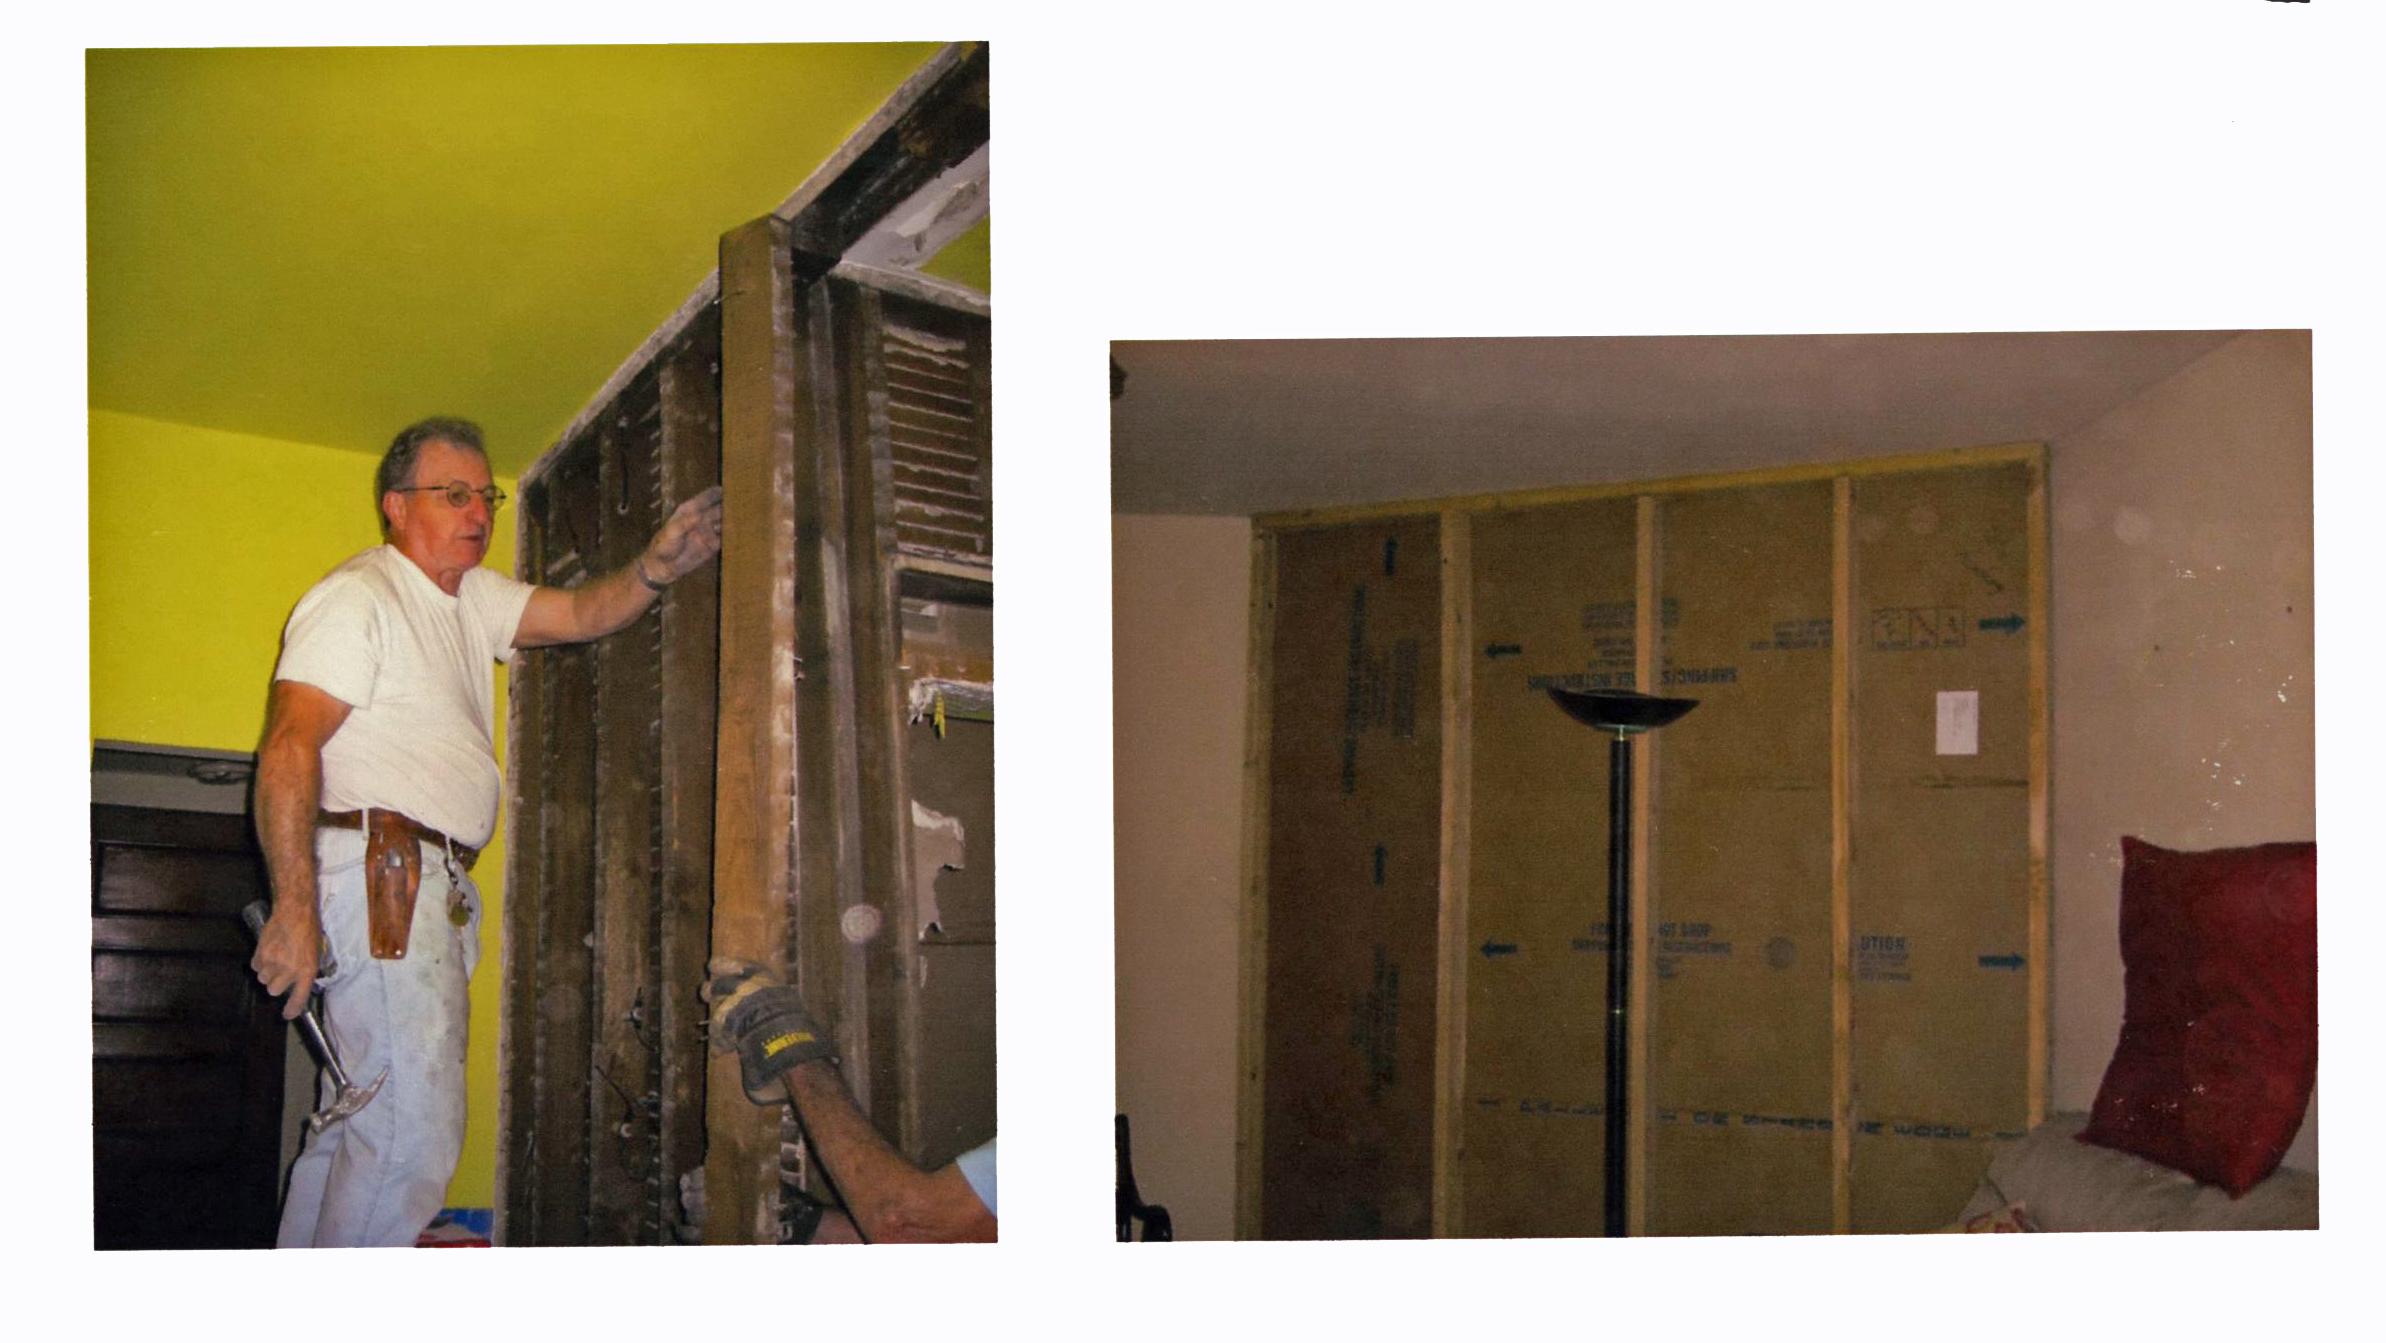 kitchen remodel pix 3 pittsburgh remodeling bathrooms